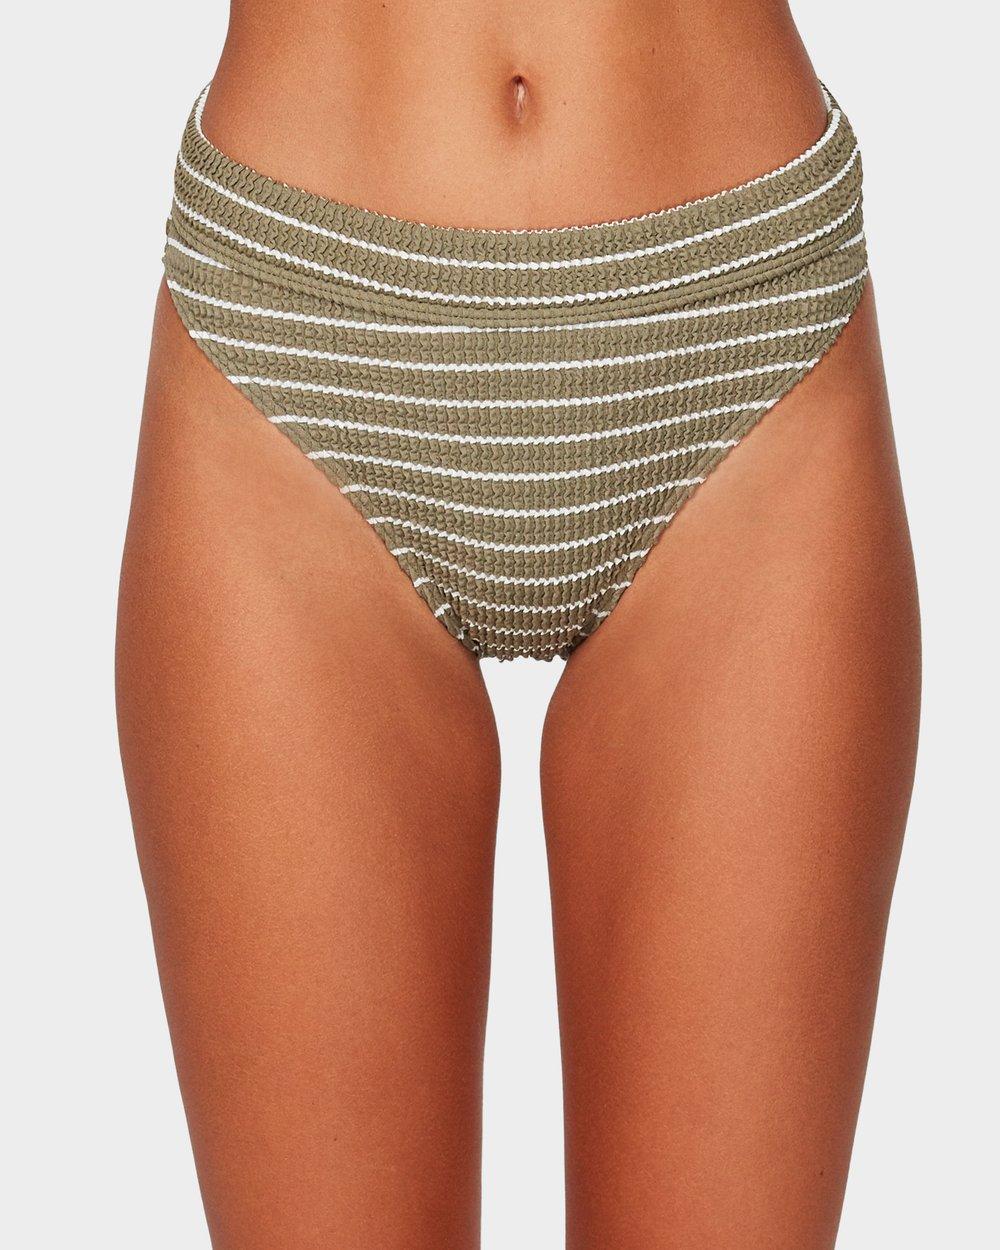 00224d032336e4 Hula Stripe Maui Rider Bikini Bottoms by Billabong Online